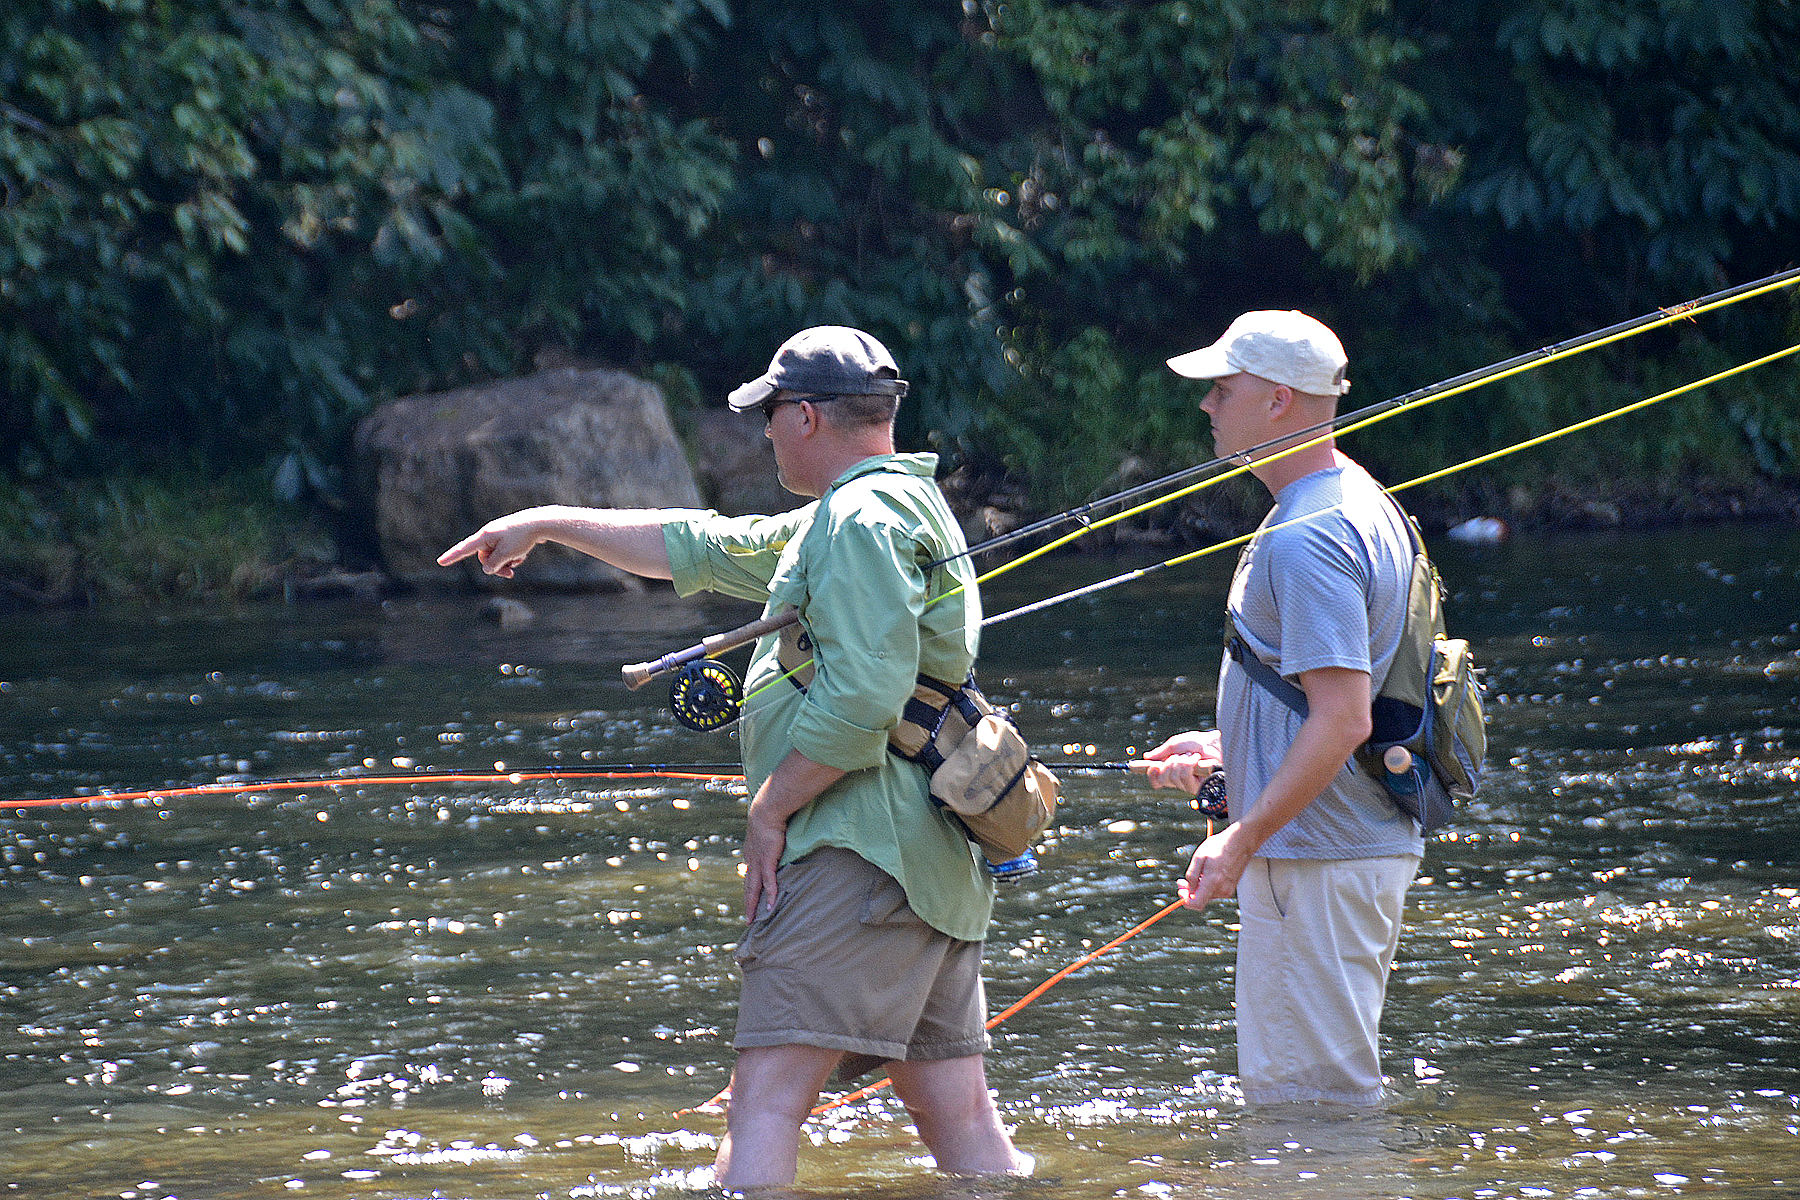 pie de inmersion, riesgo pescar, tartamiento, lesion pie, pesca